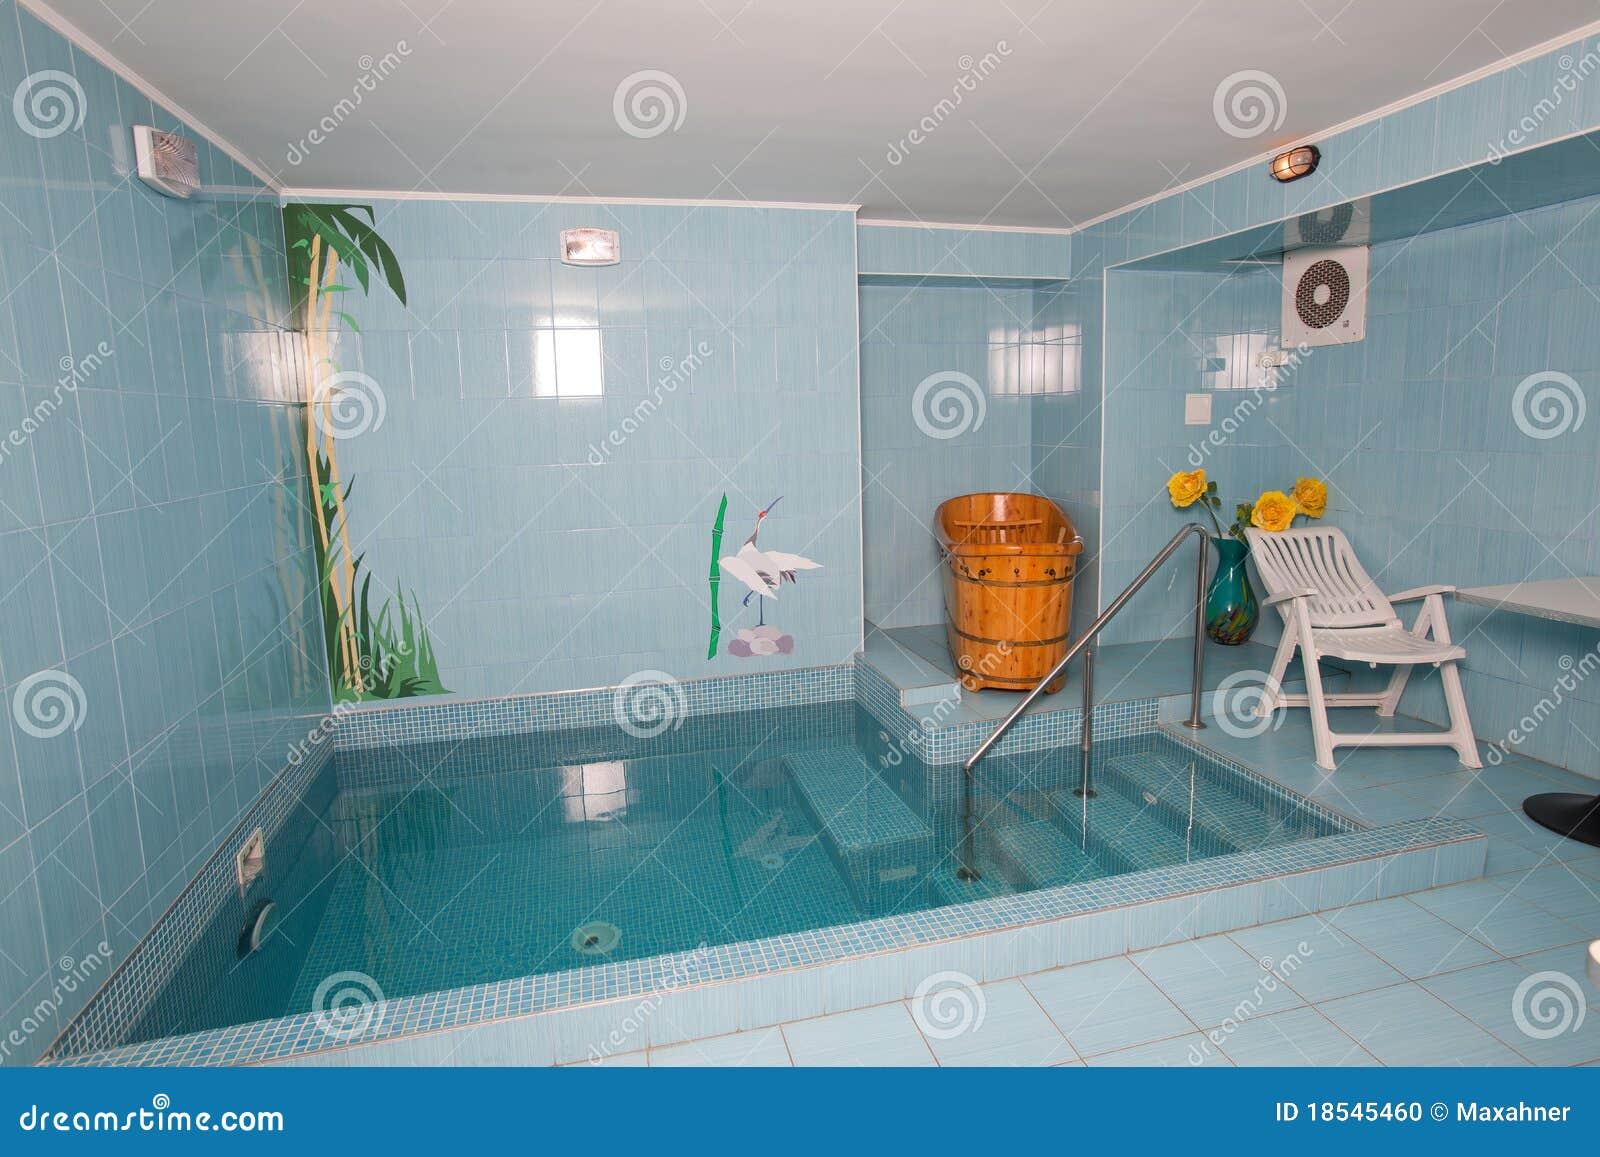 Salle de bains avec la petite piscine photo stock image - Salle de bain sauna ...